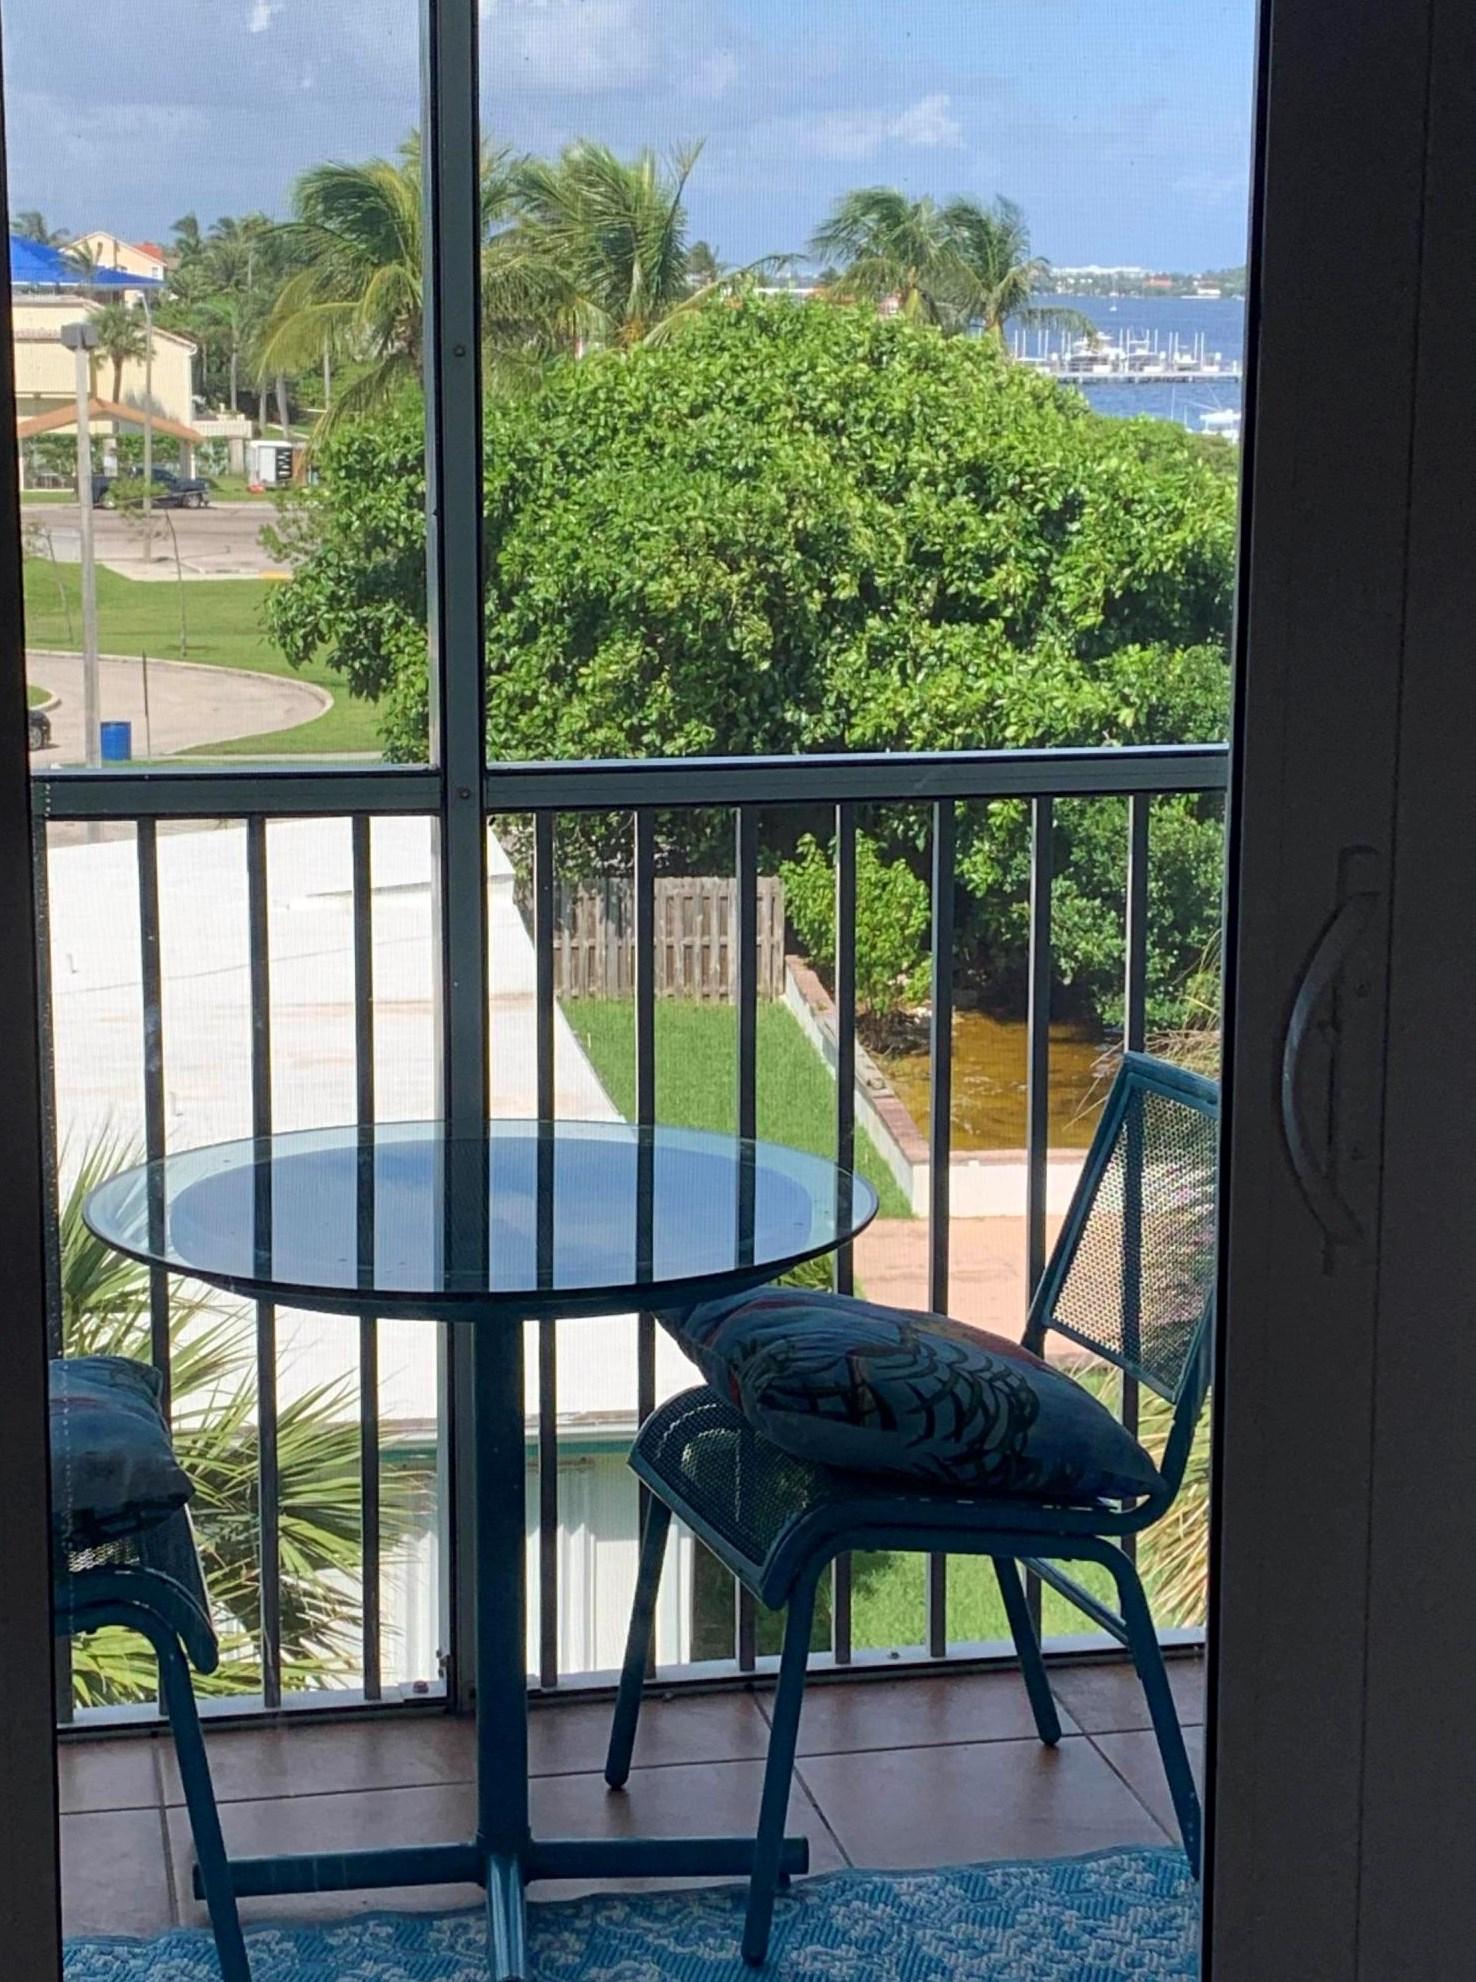 1820 New Palm Way, Boynton Beach FL  33435-2844 exterior